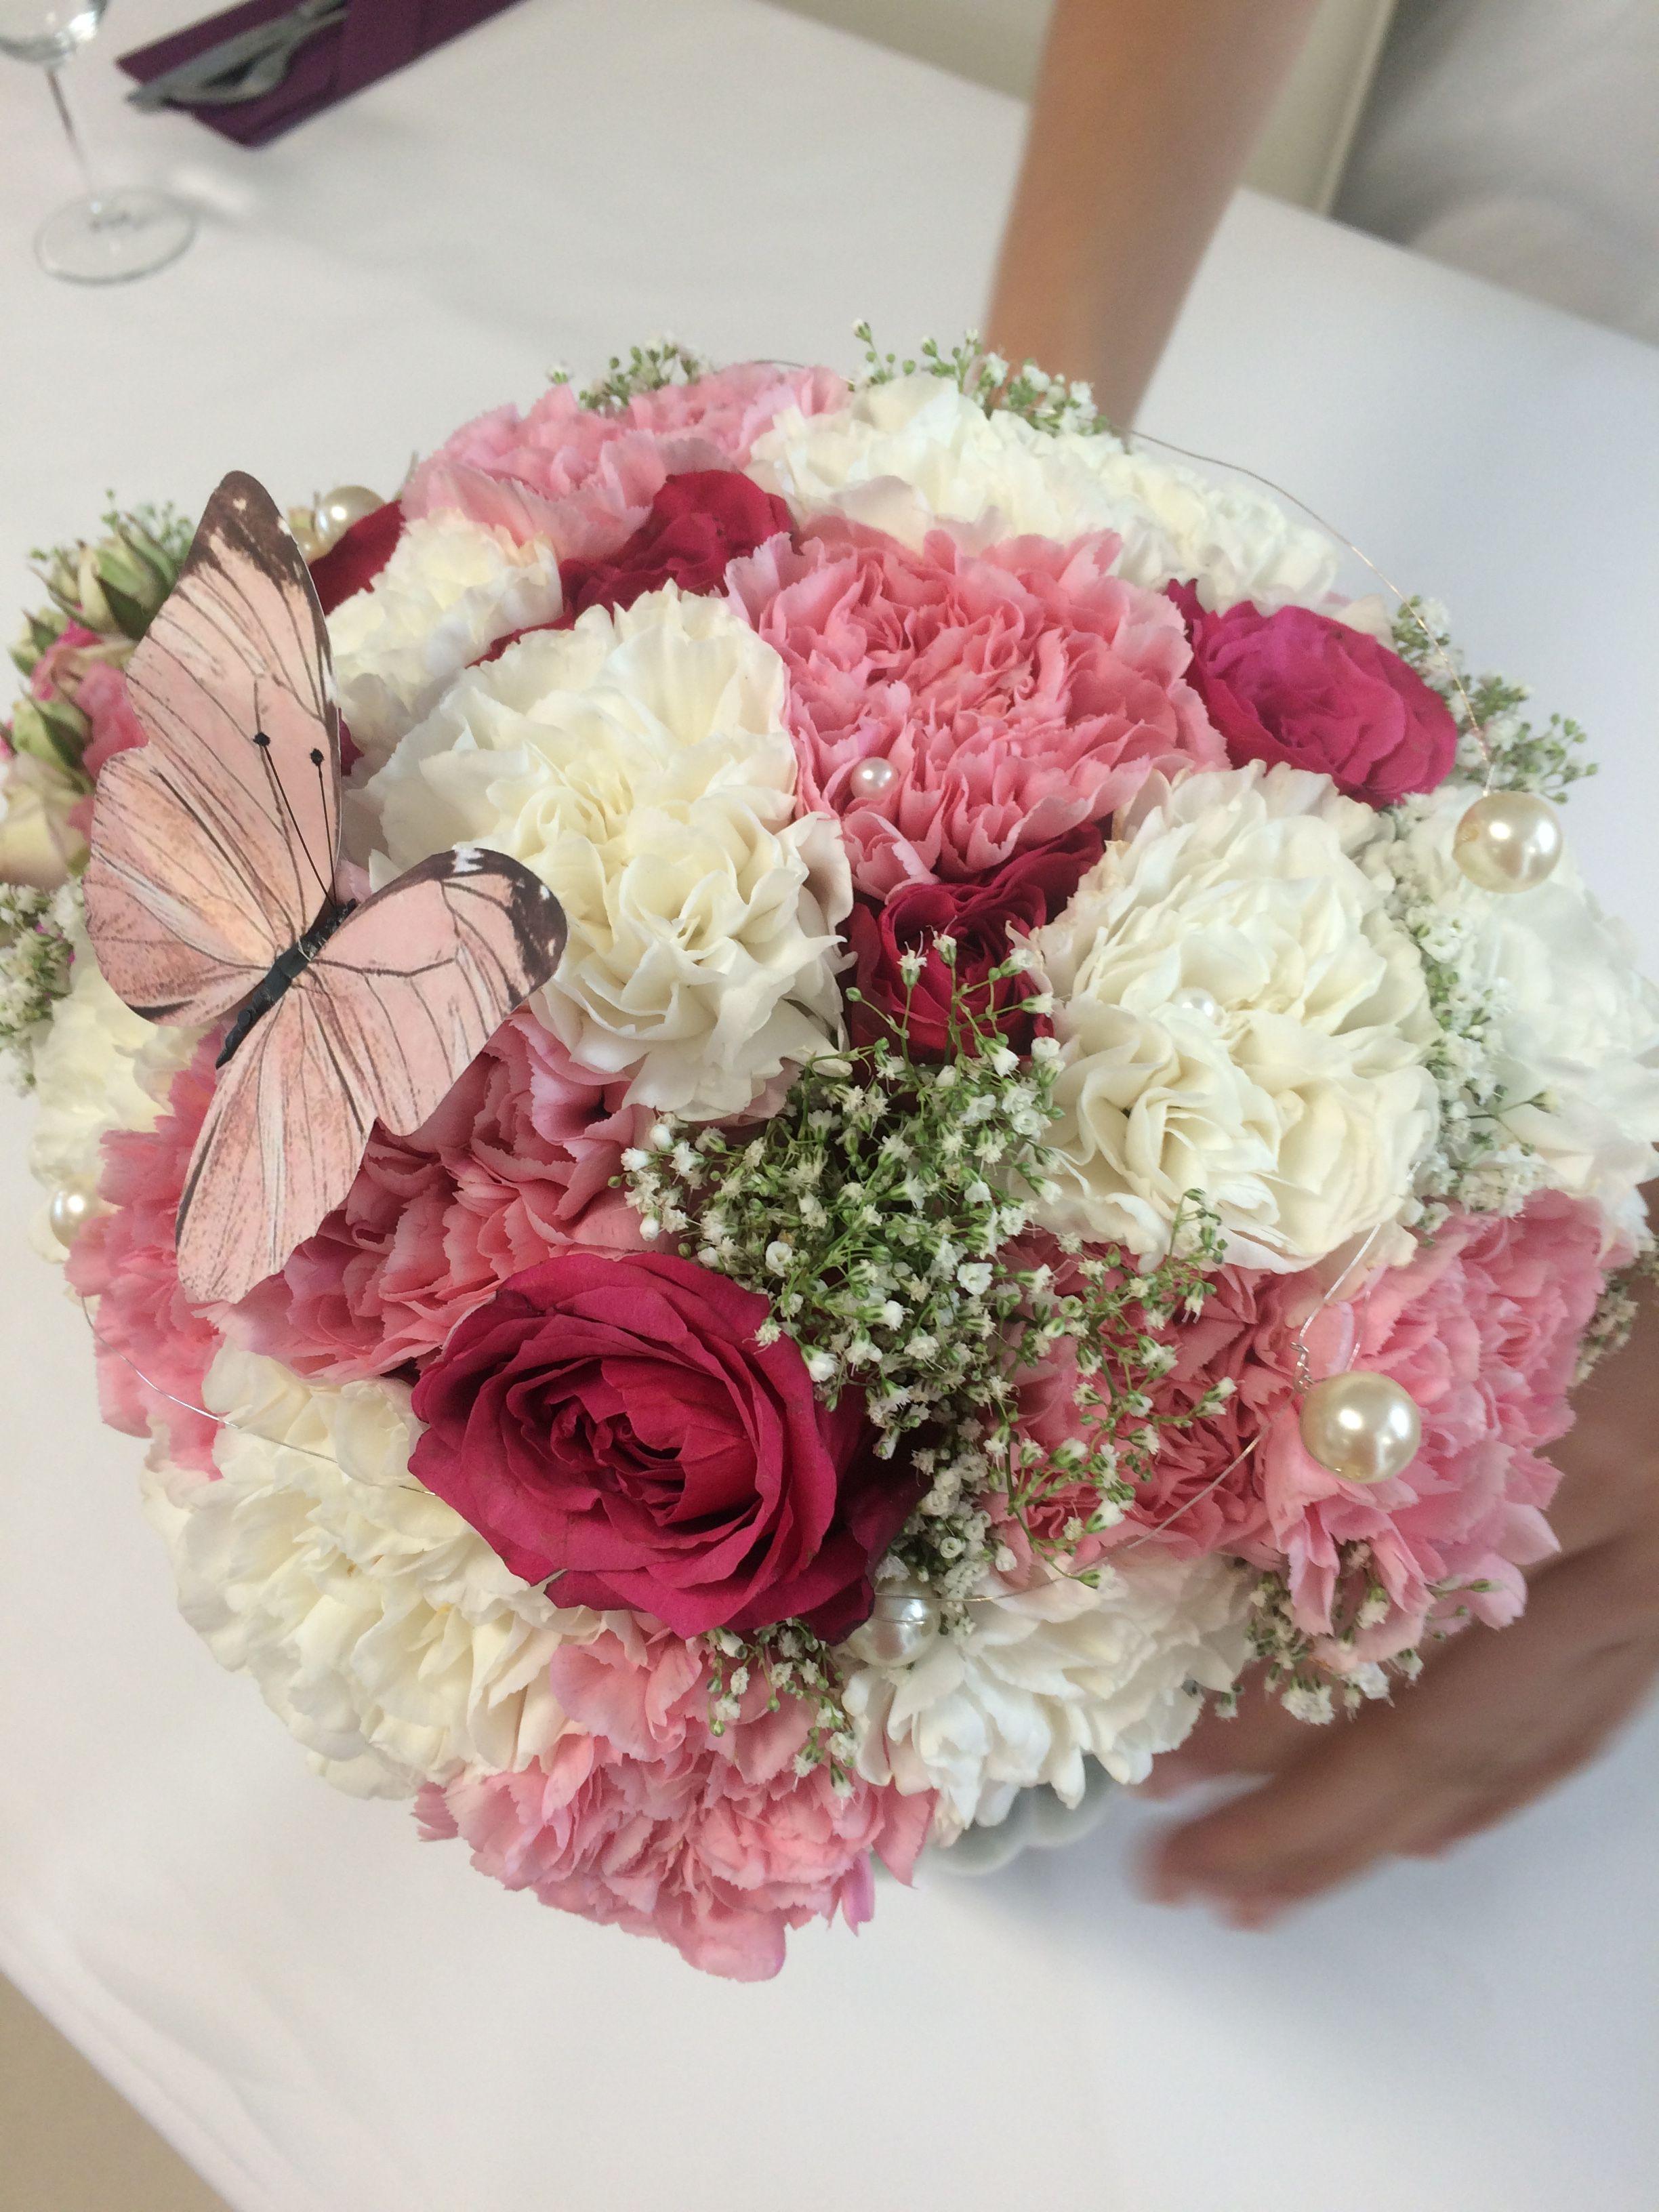 Brautstrauss In Beerentone Himmbeerfarbene Rosen Und Nelken In Rosa